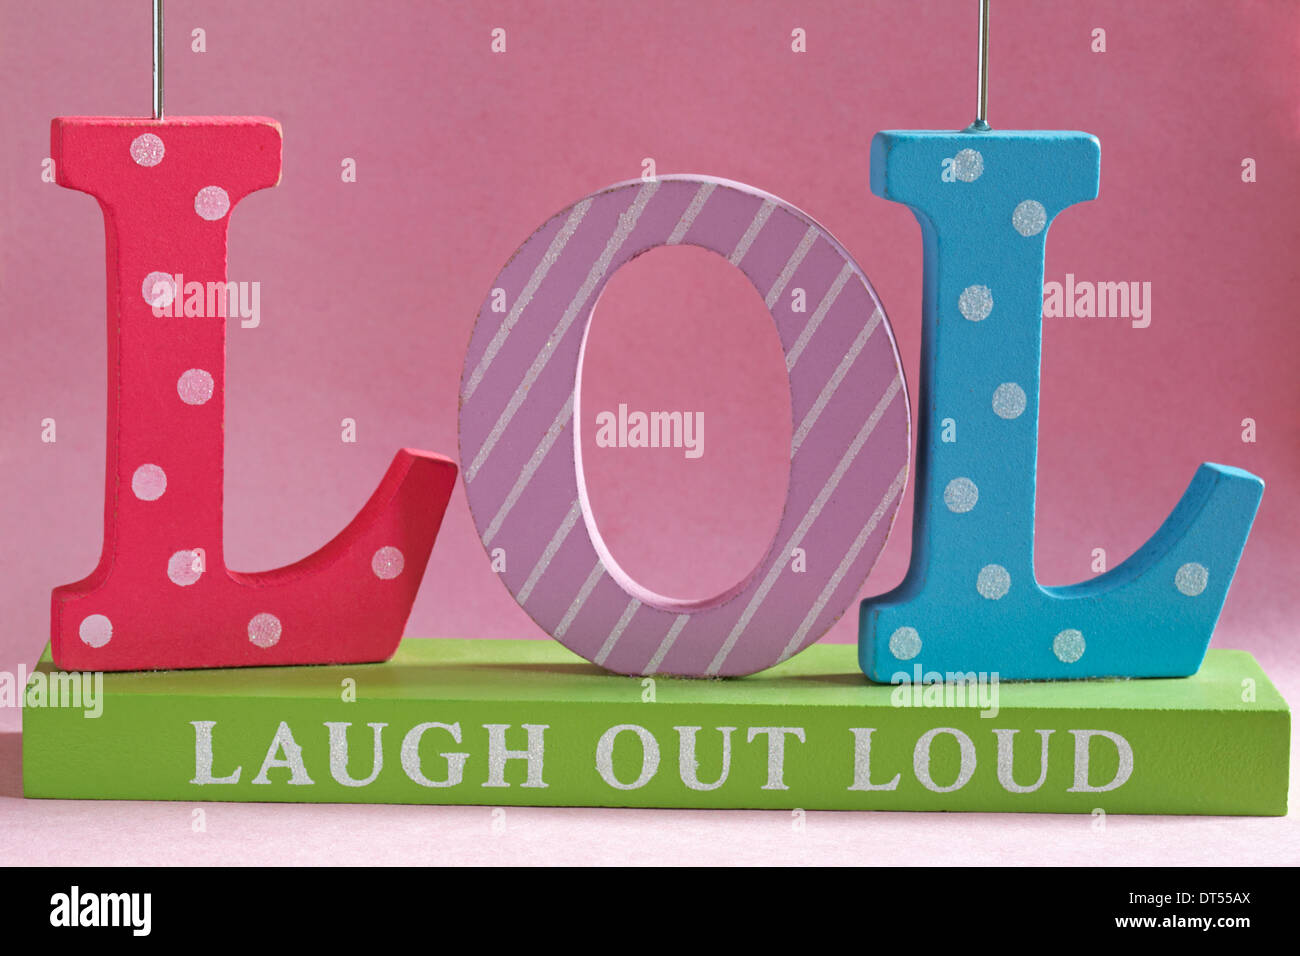 LOL Laugh Out Loud Decorative Letters Set Against Pink Background